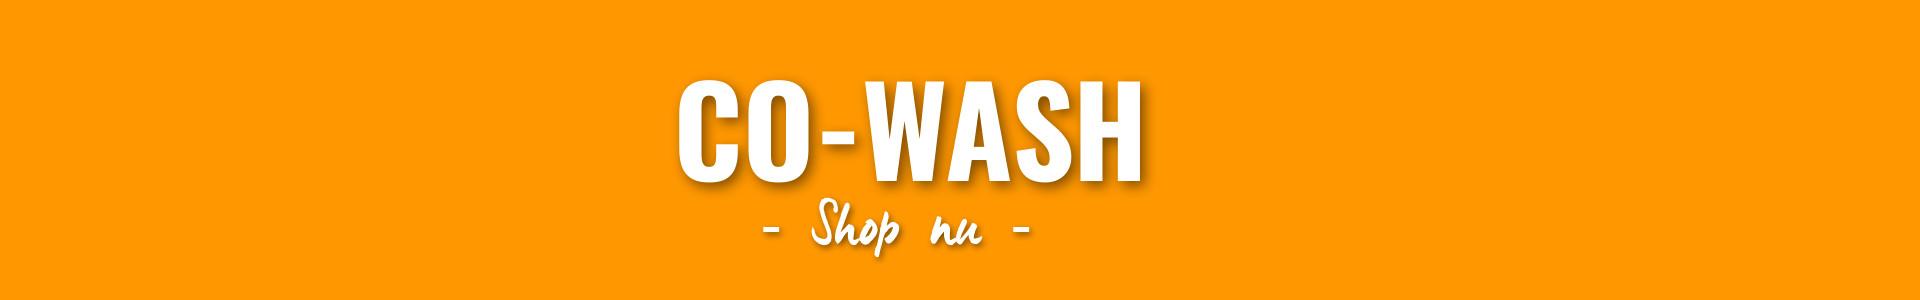 Co-Wash